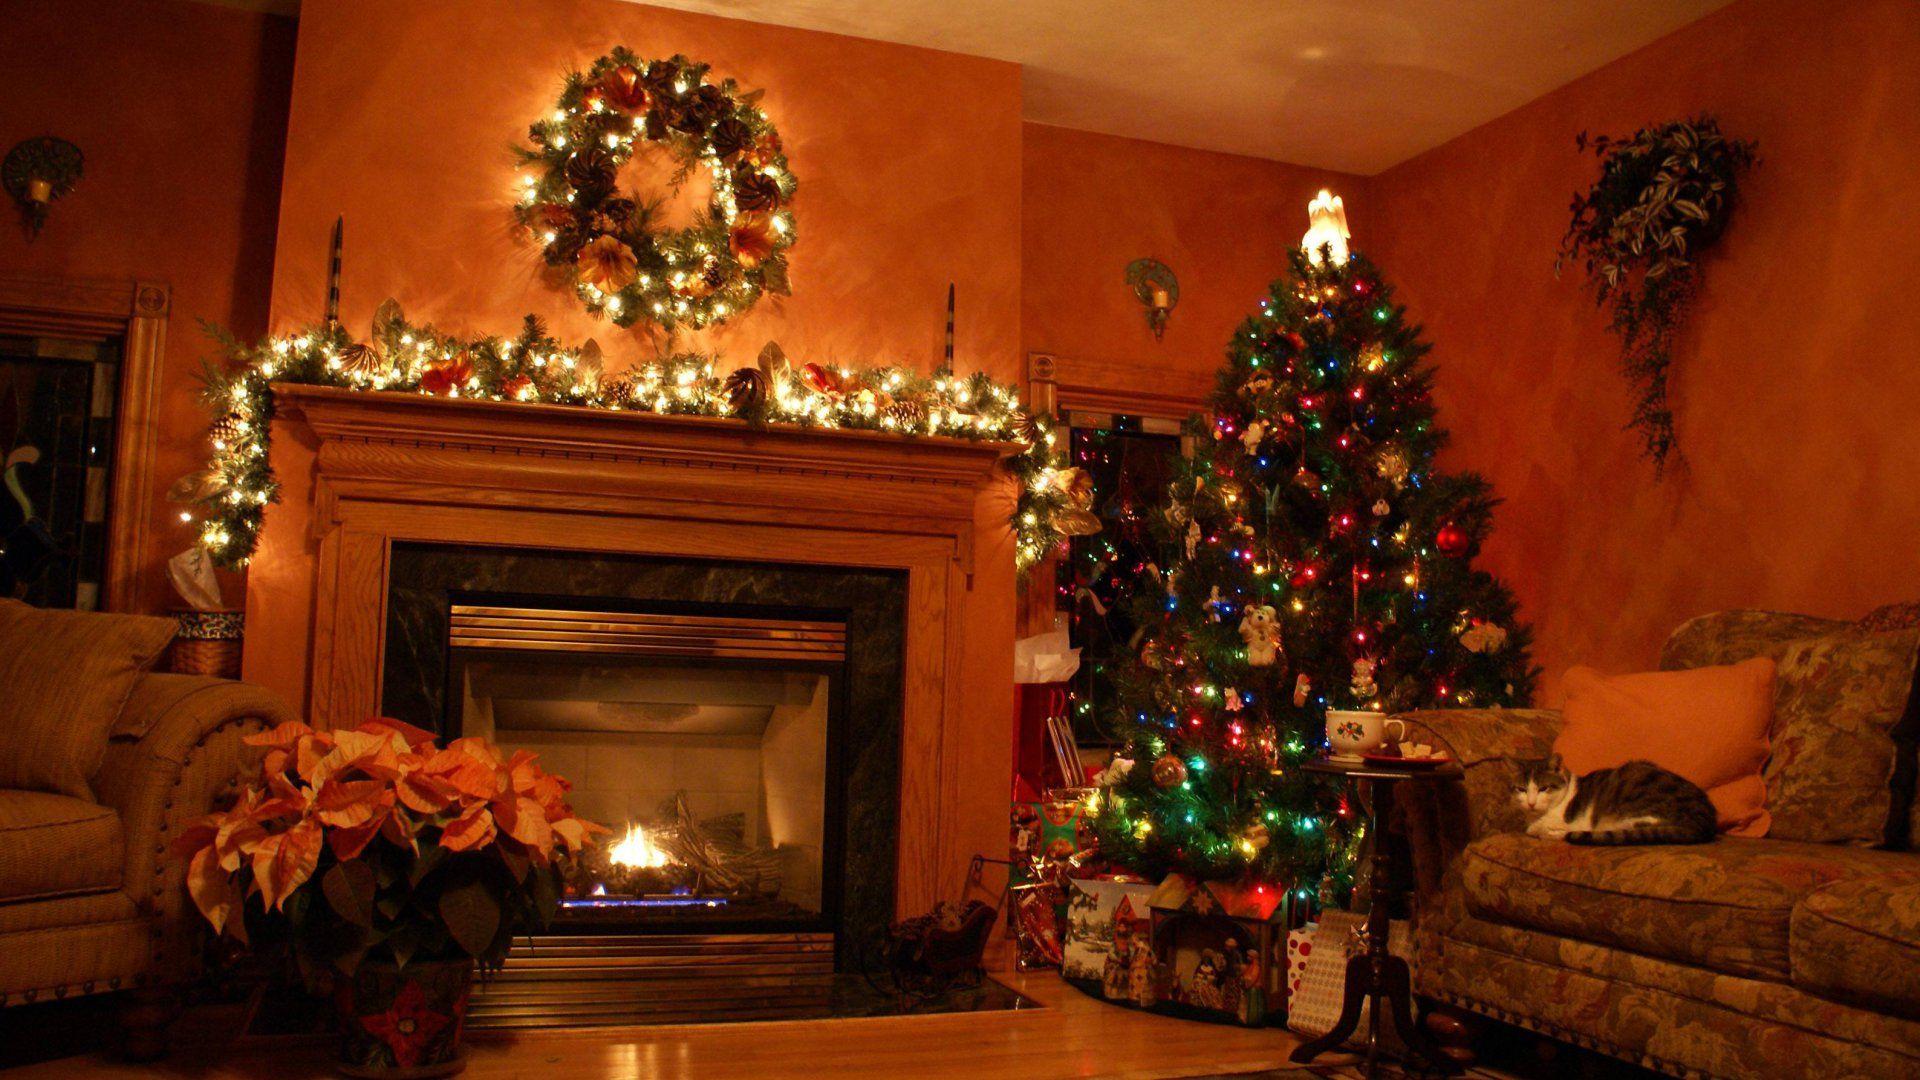 Christmas Fireplace Comfort download nice wallpaper